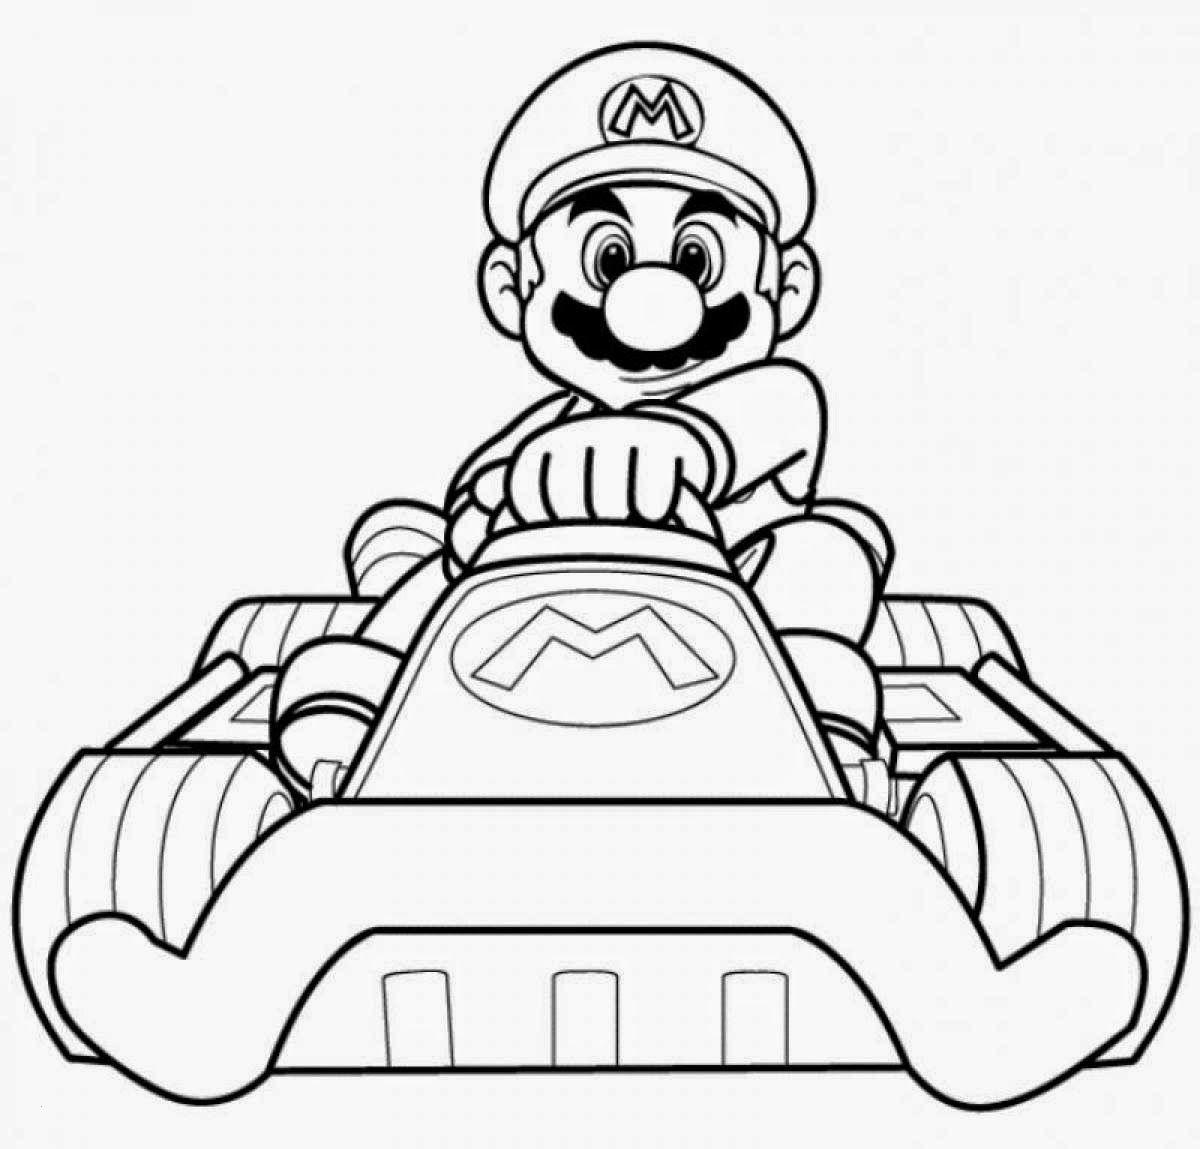 Mario Kart Ausmalbild Inspirierend 40 Bvb Ausmalbilder Scoredatscore Inspirierend Mario Kart Das Bild